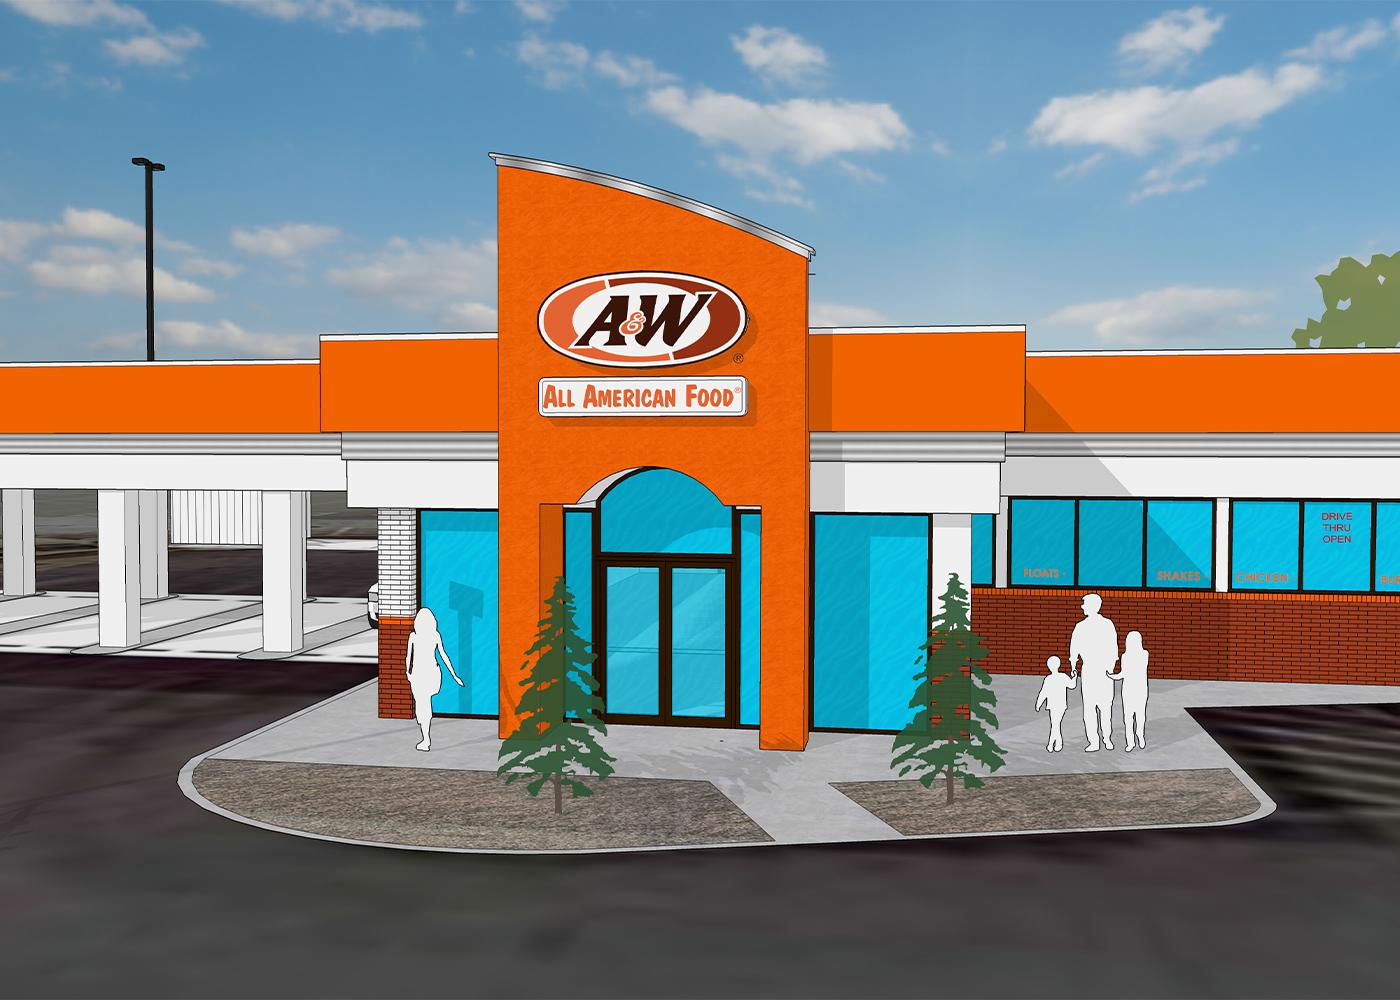 Rendering of A&W Restaurant exterior in Belleville, Illinois.